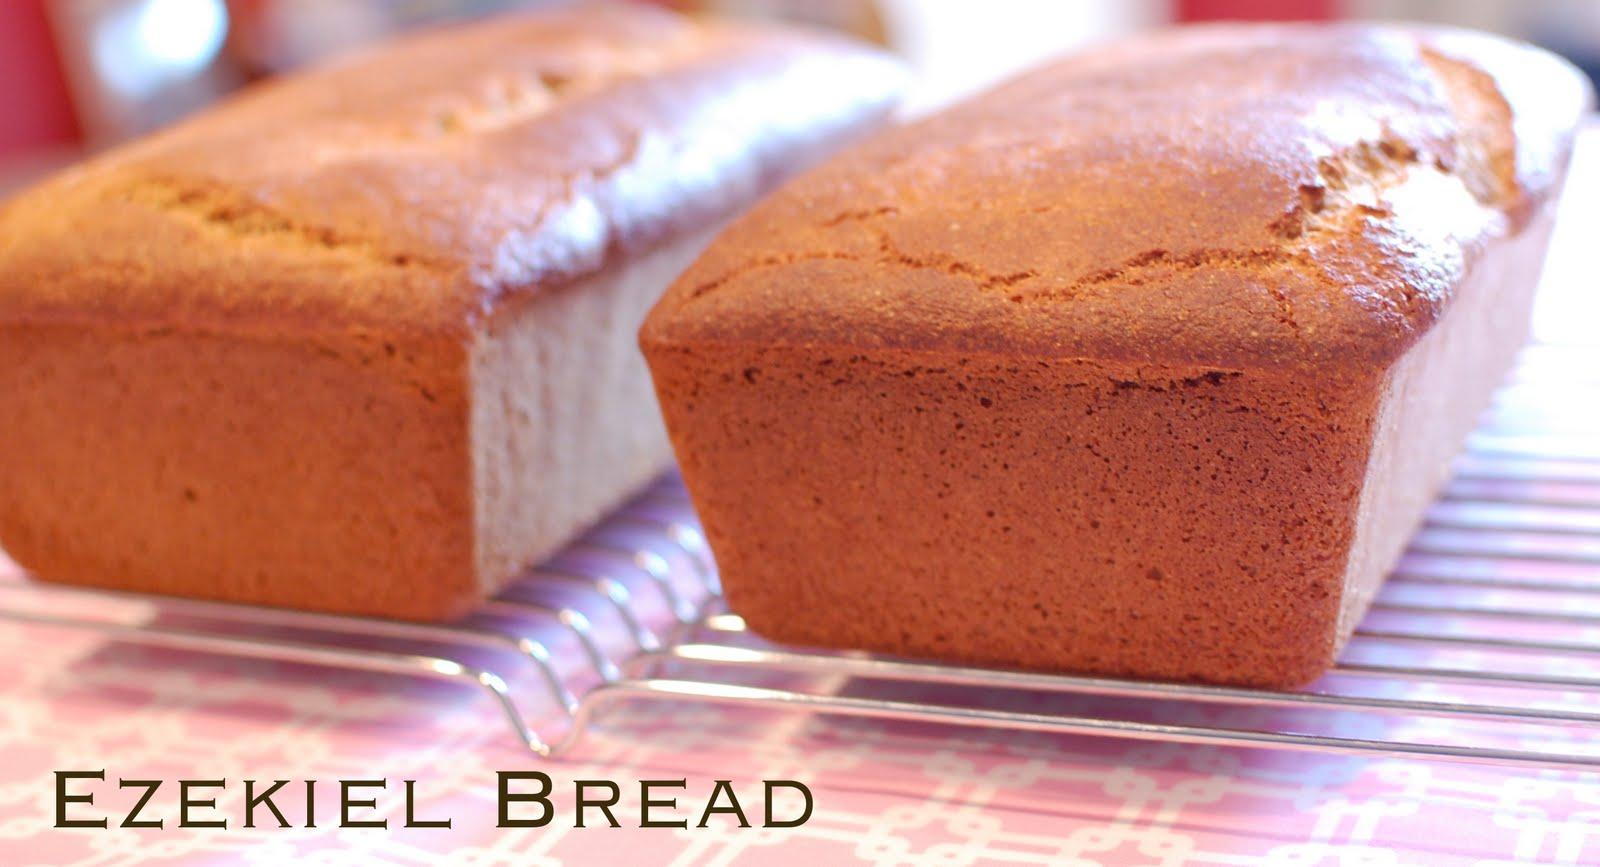 Ezekiel Bread A Small Snippet